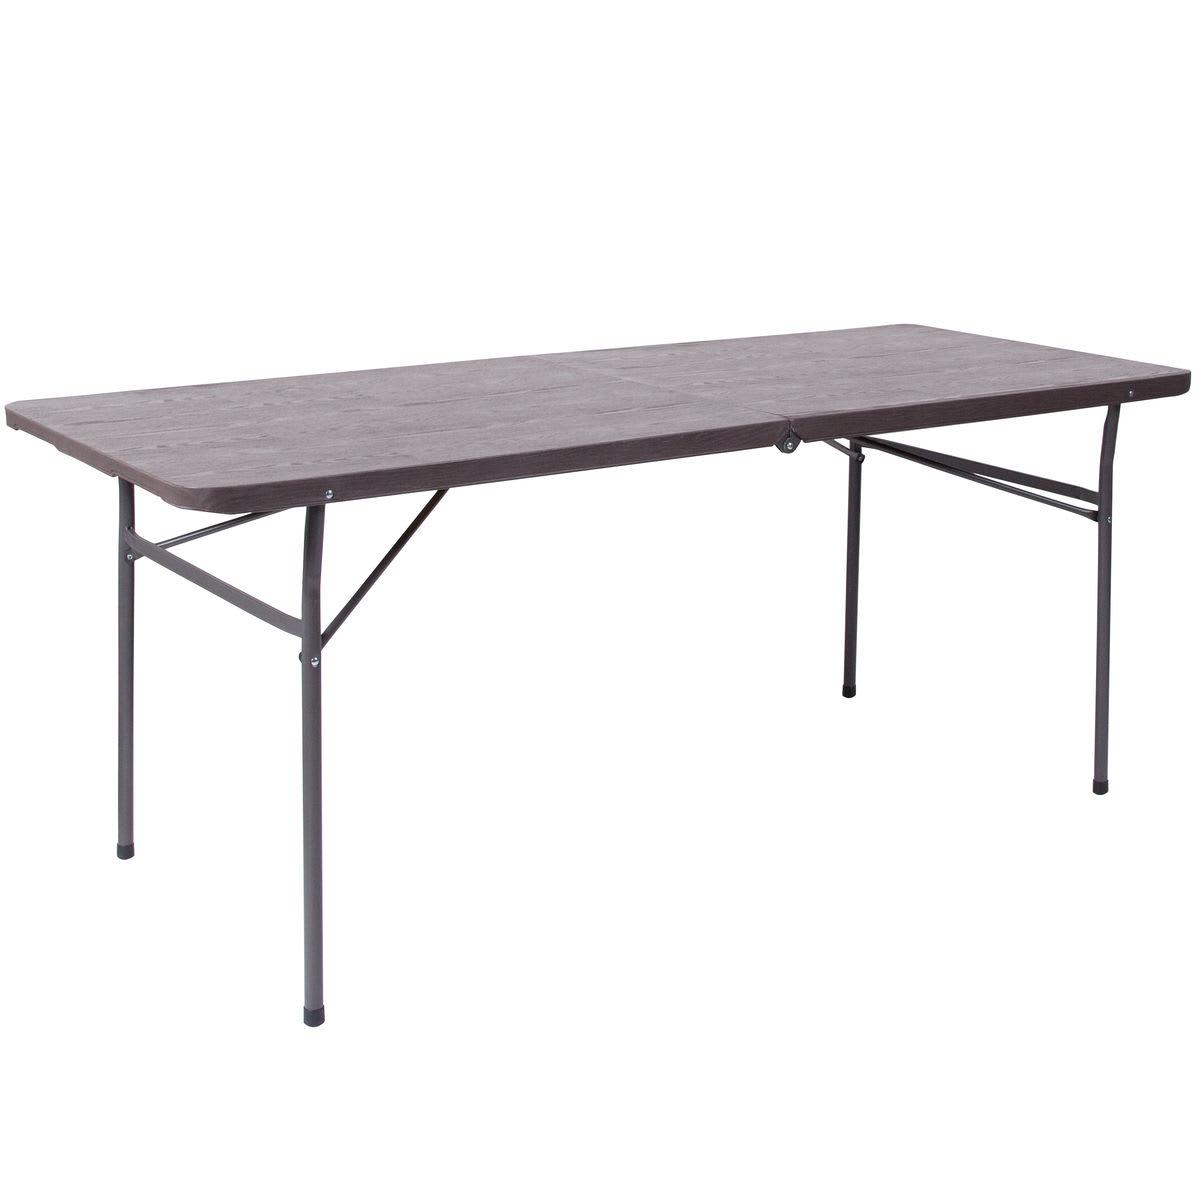 Wood Grain Plastic Folding Table